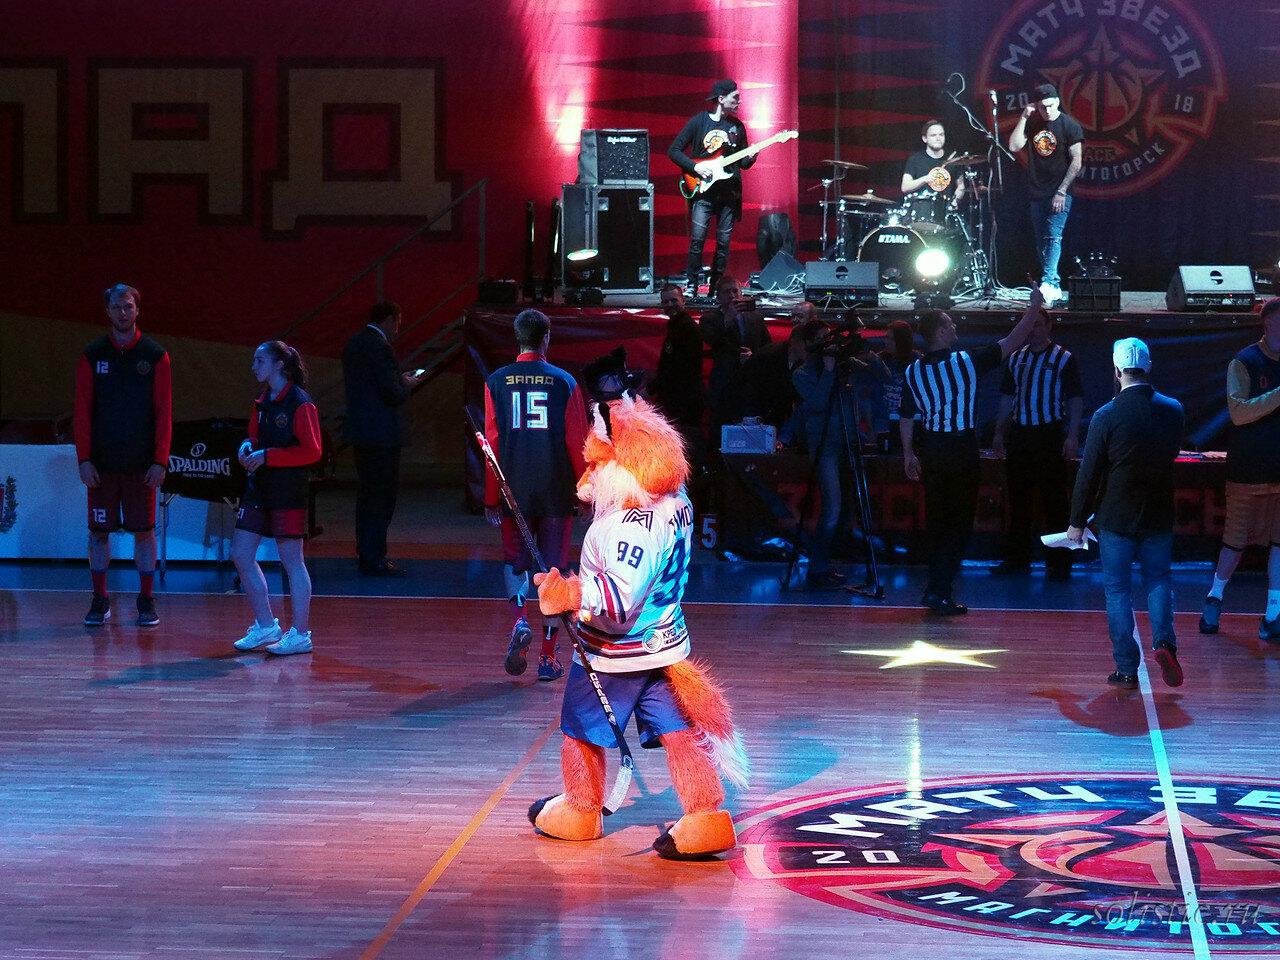 2 Матч звезд АСБ 2018 (ассоциации студенческого баскетбола)